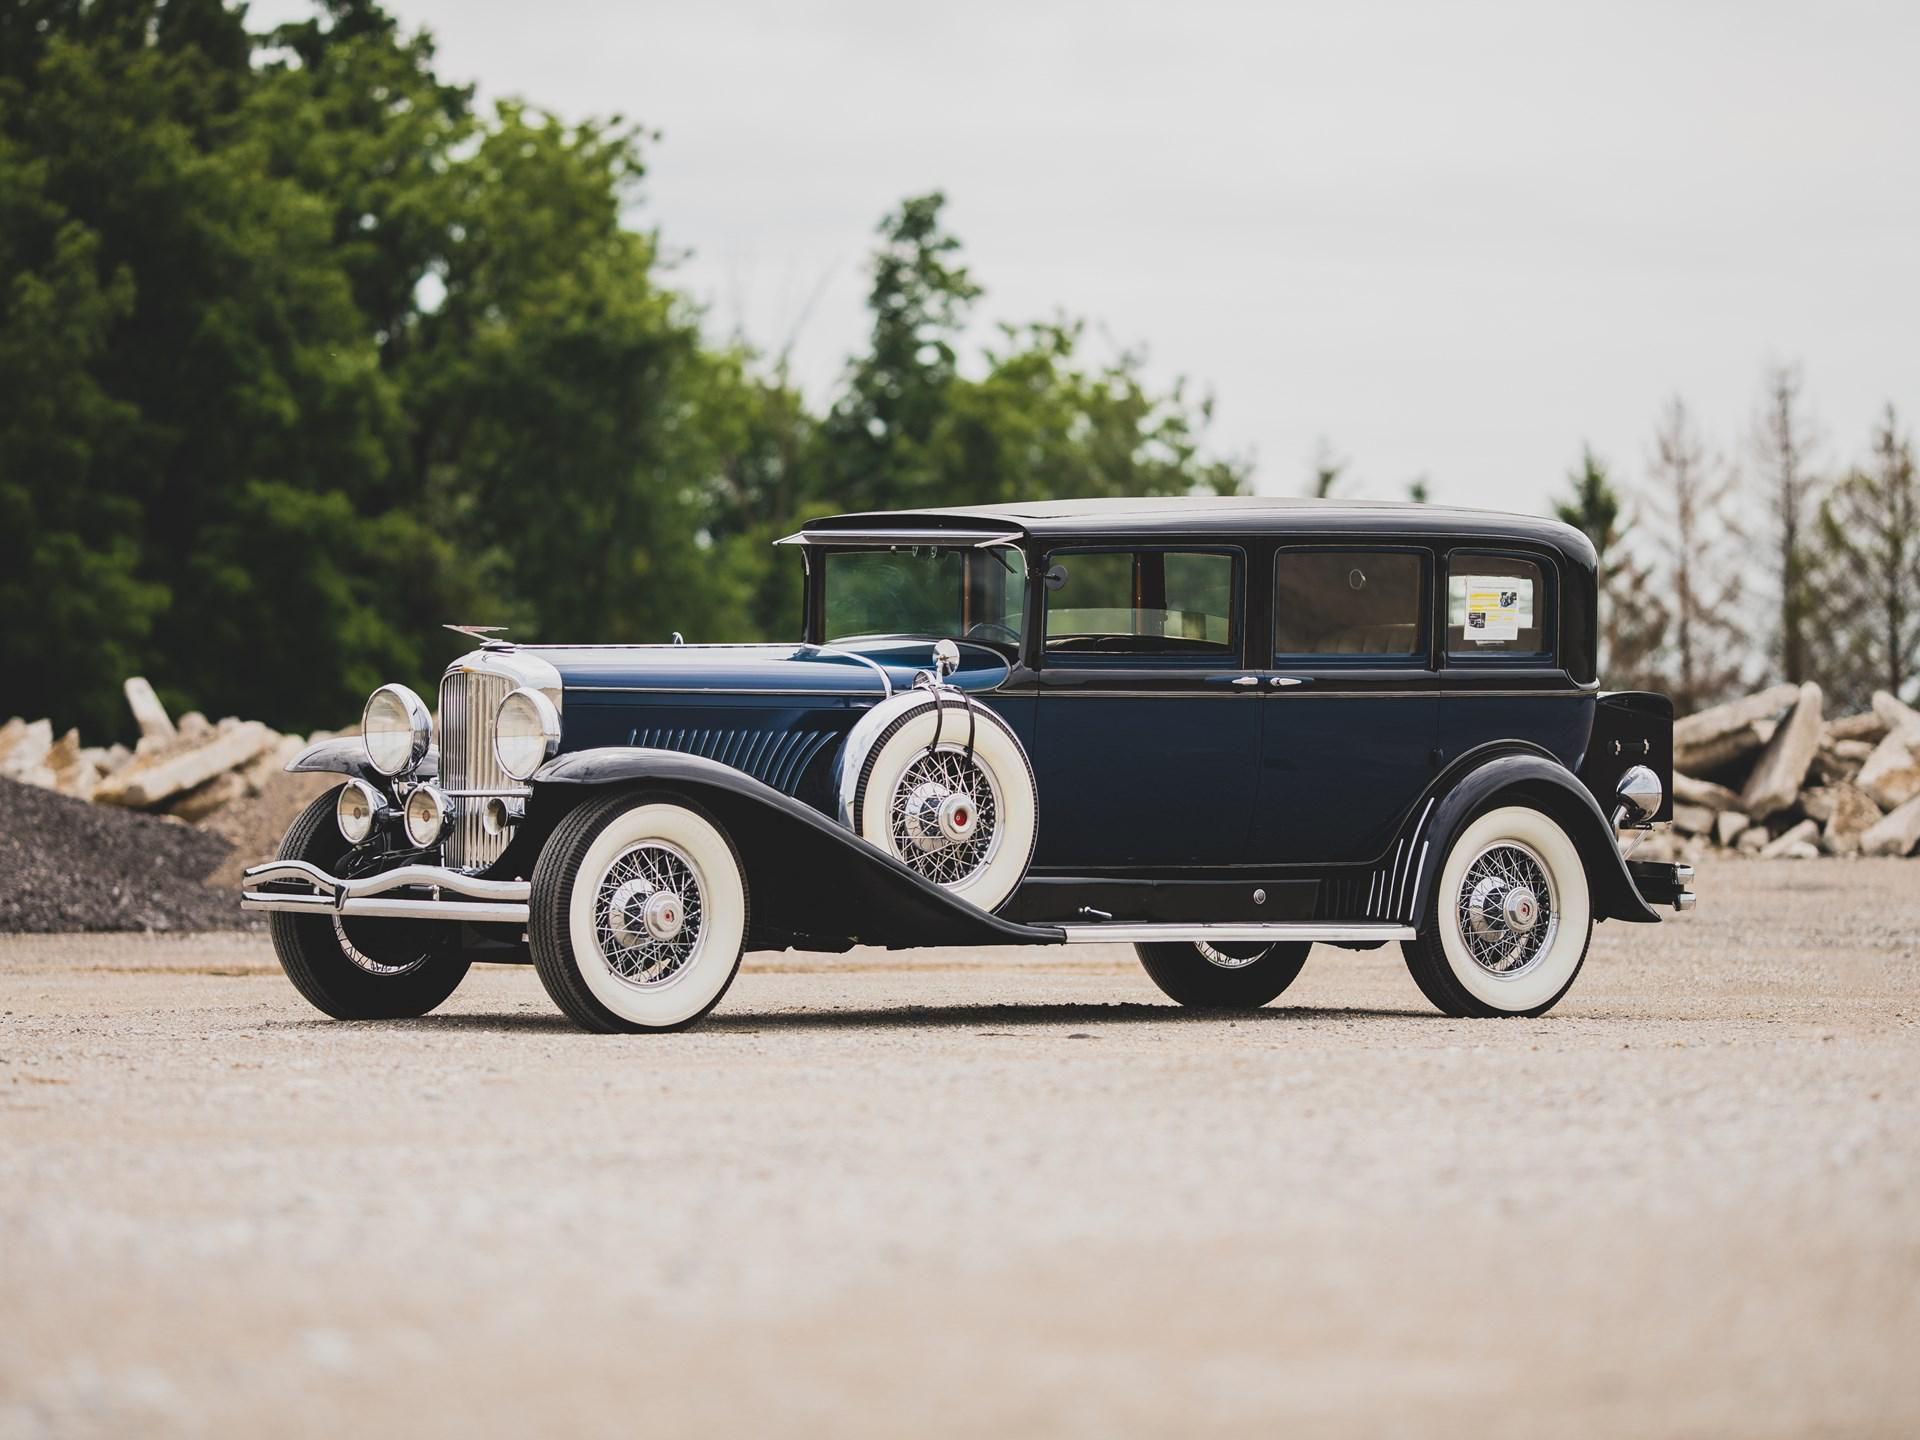 1931 Duesenberg Model J Limousine by Willoughby